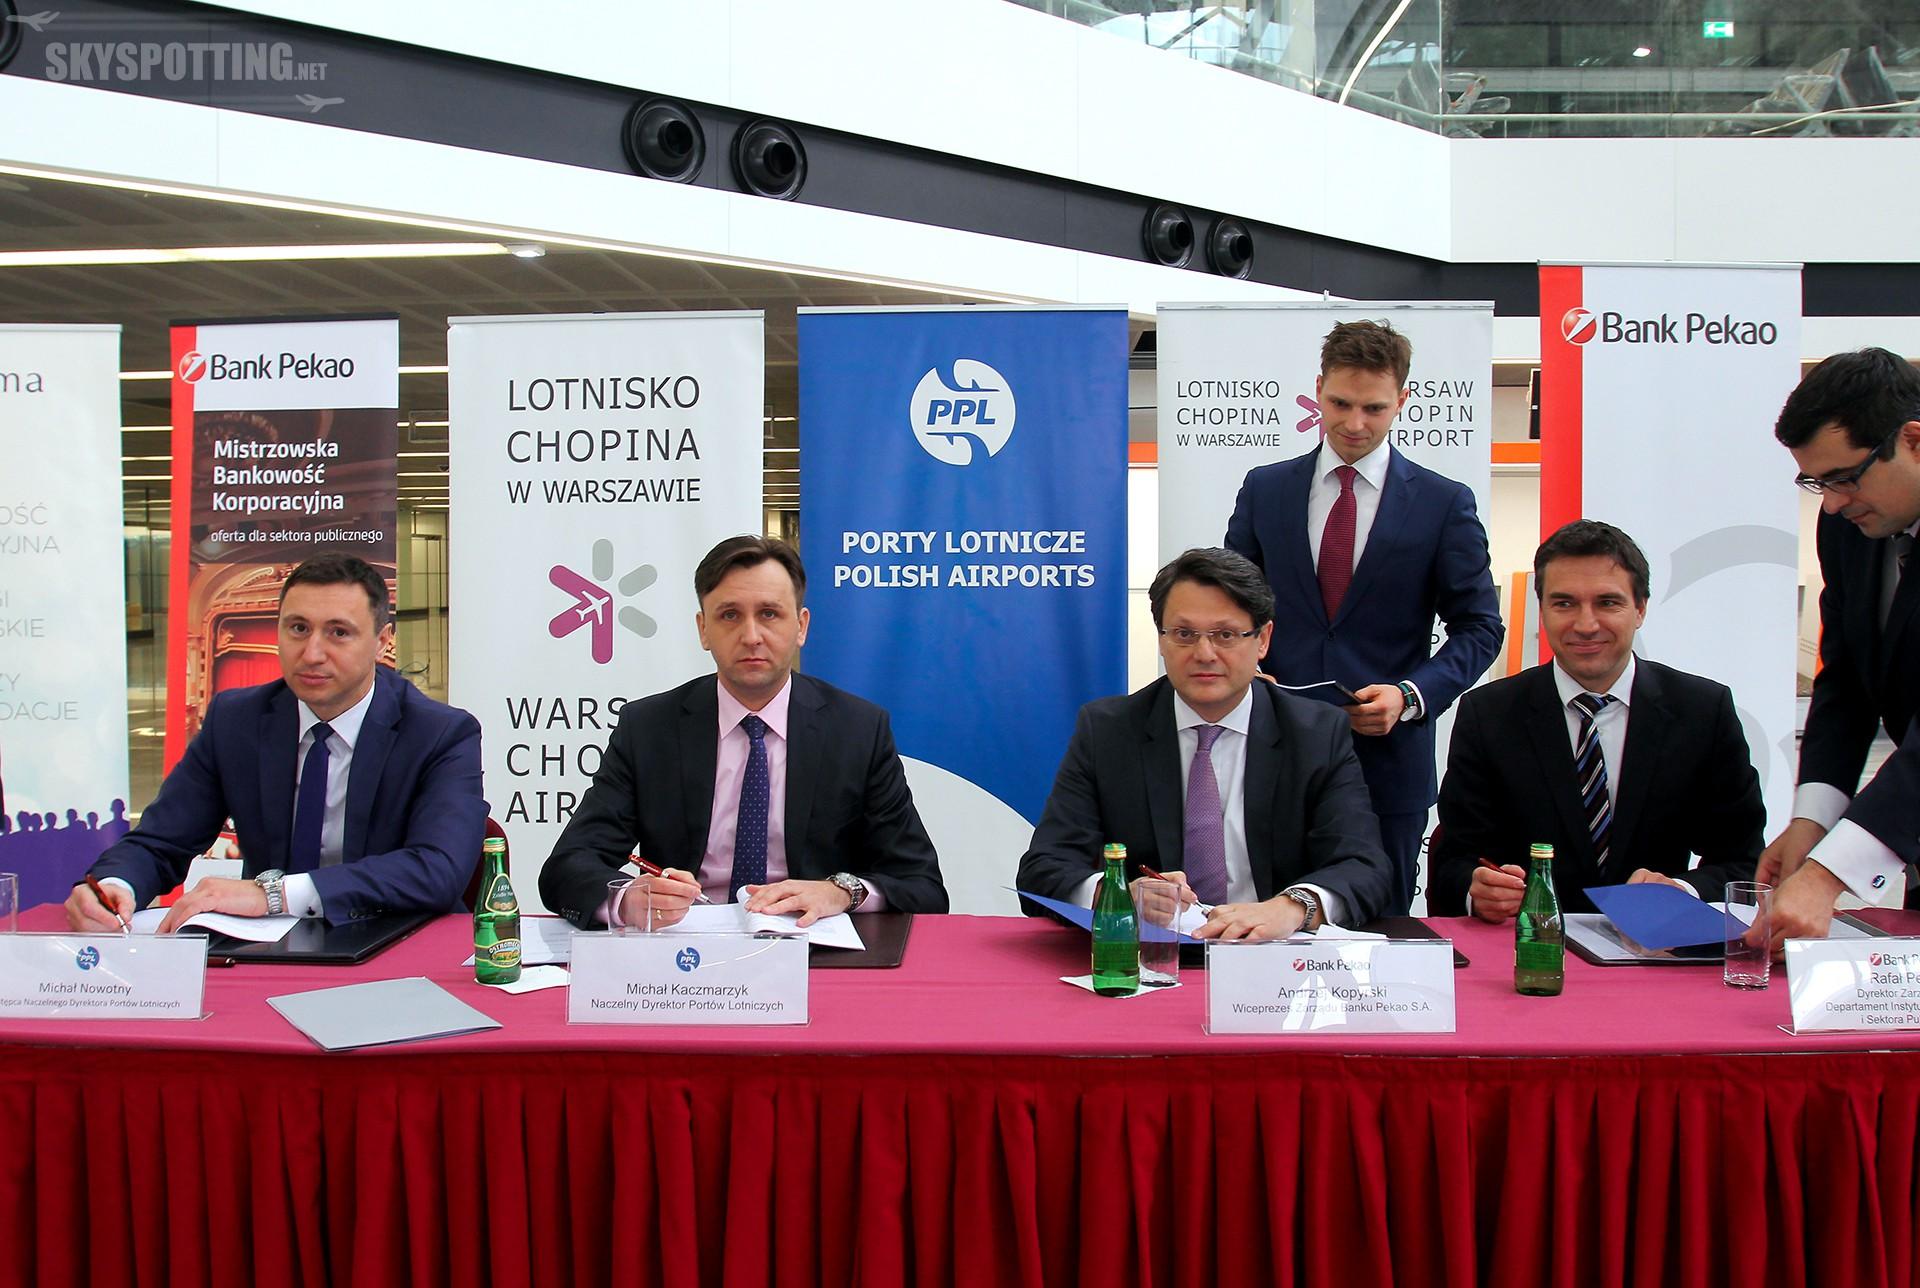 600 mln zł na rozbudowę Lotniska Chopina